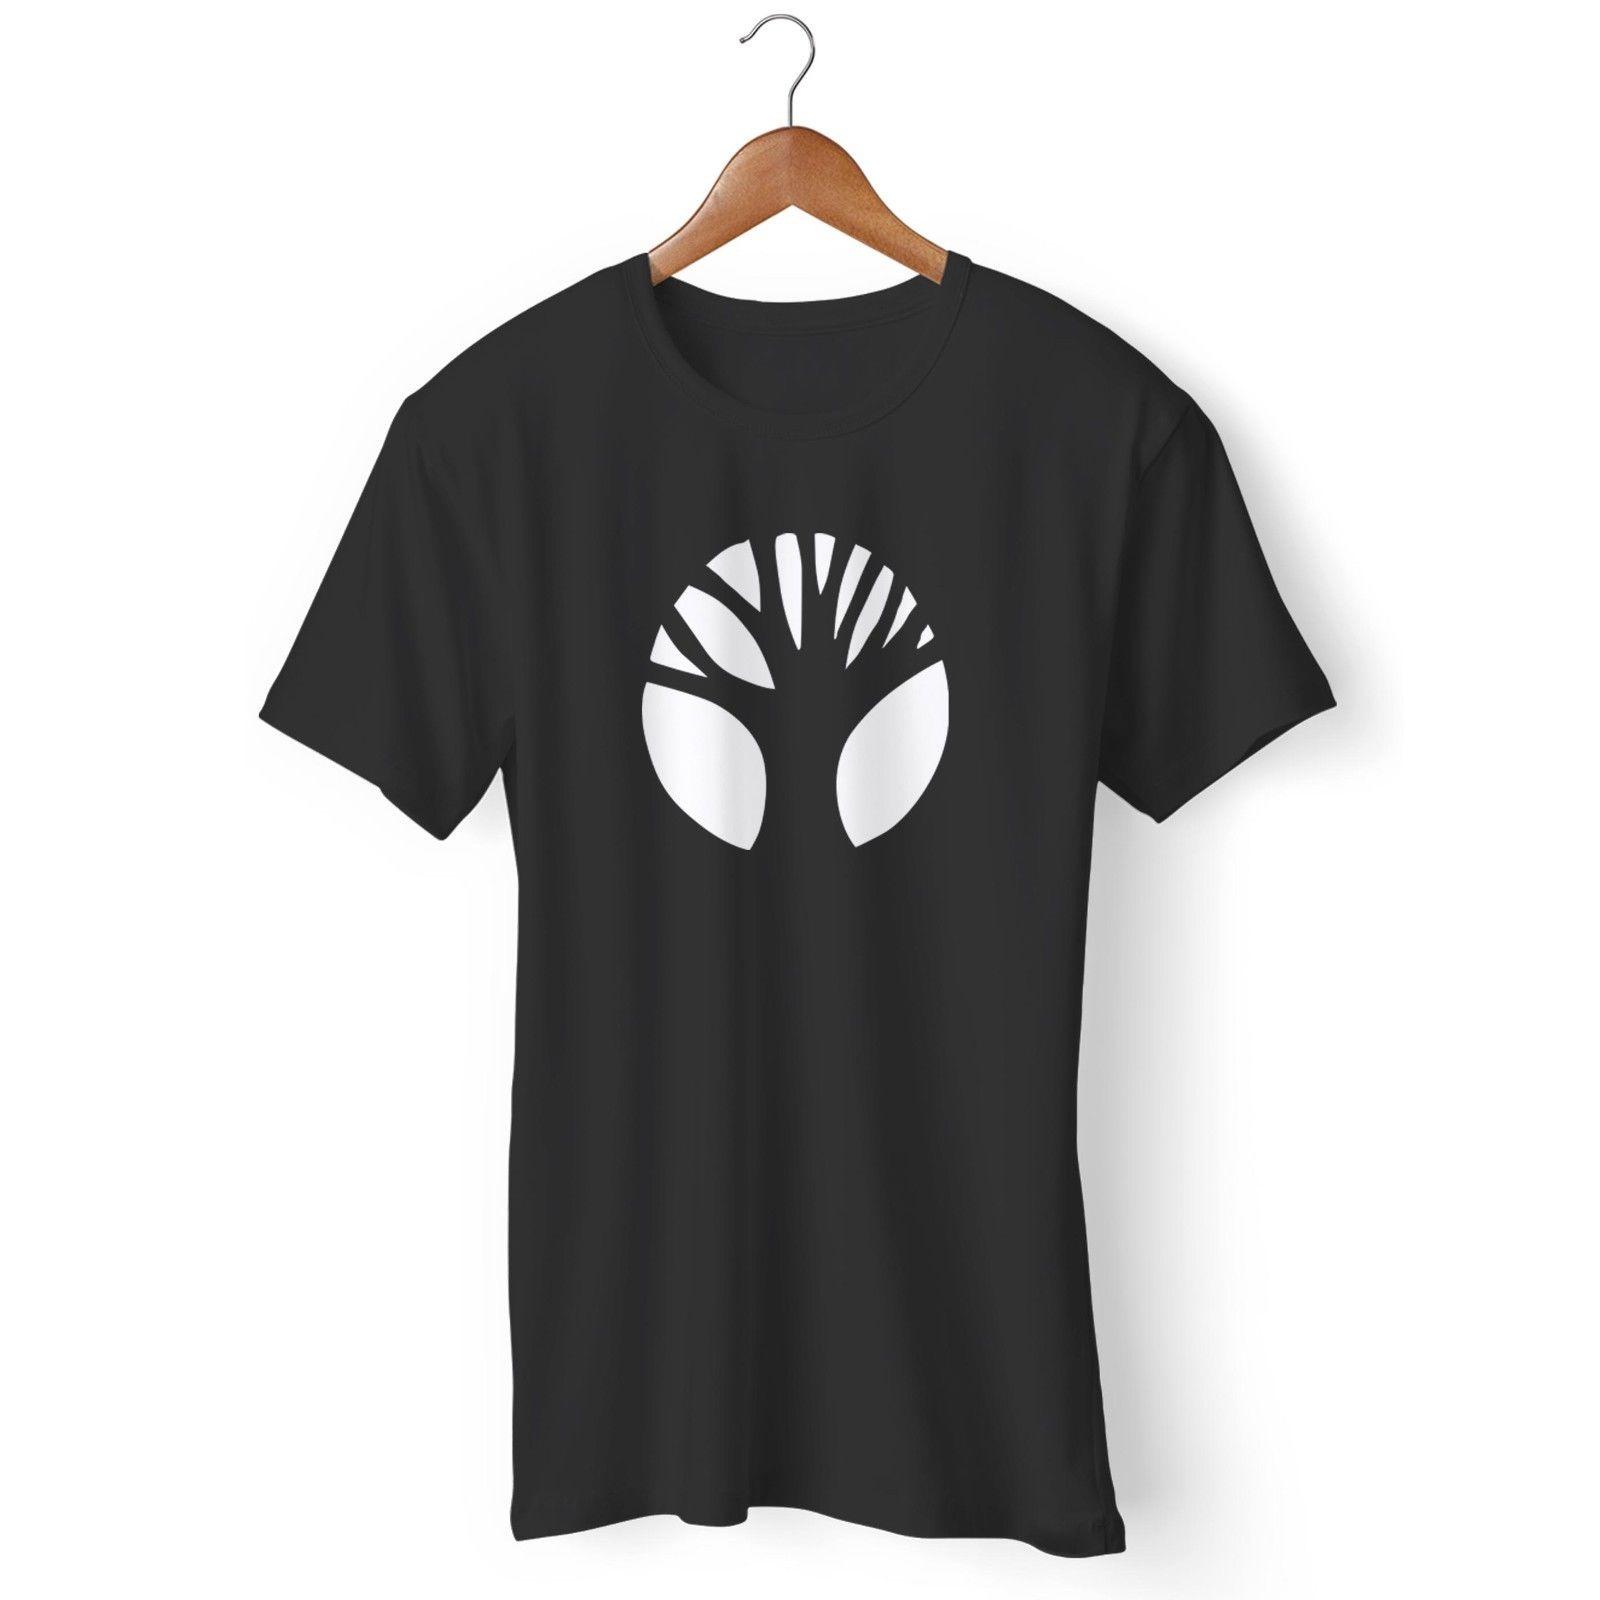 Hippie Tree Of Life Cutout Pastel Goth Grunge Boho Man's and Woman's T-ShirtCool Casual Unisex Fashion tshirt free shipping